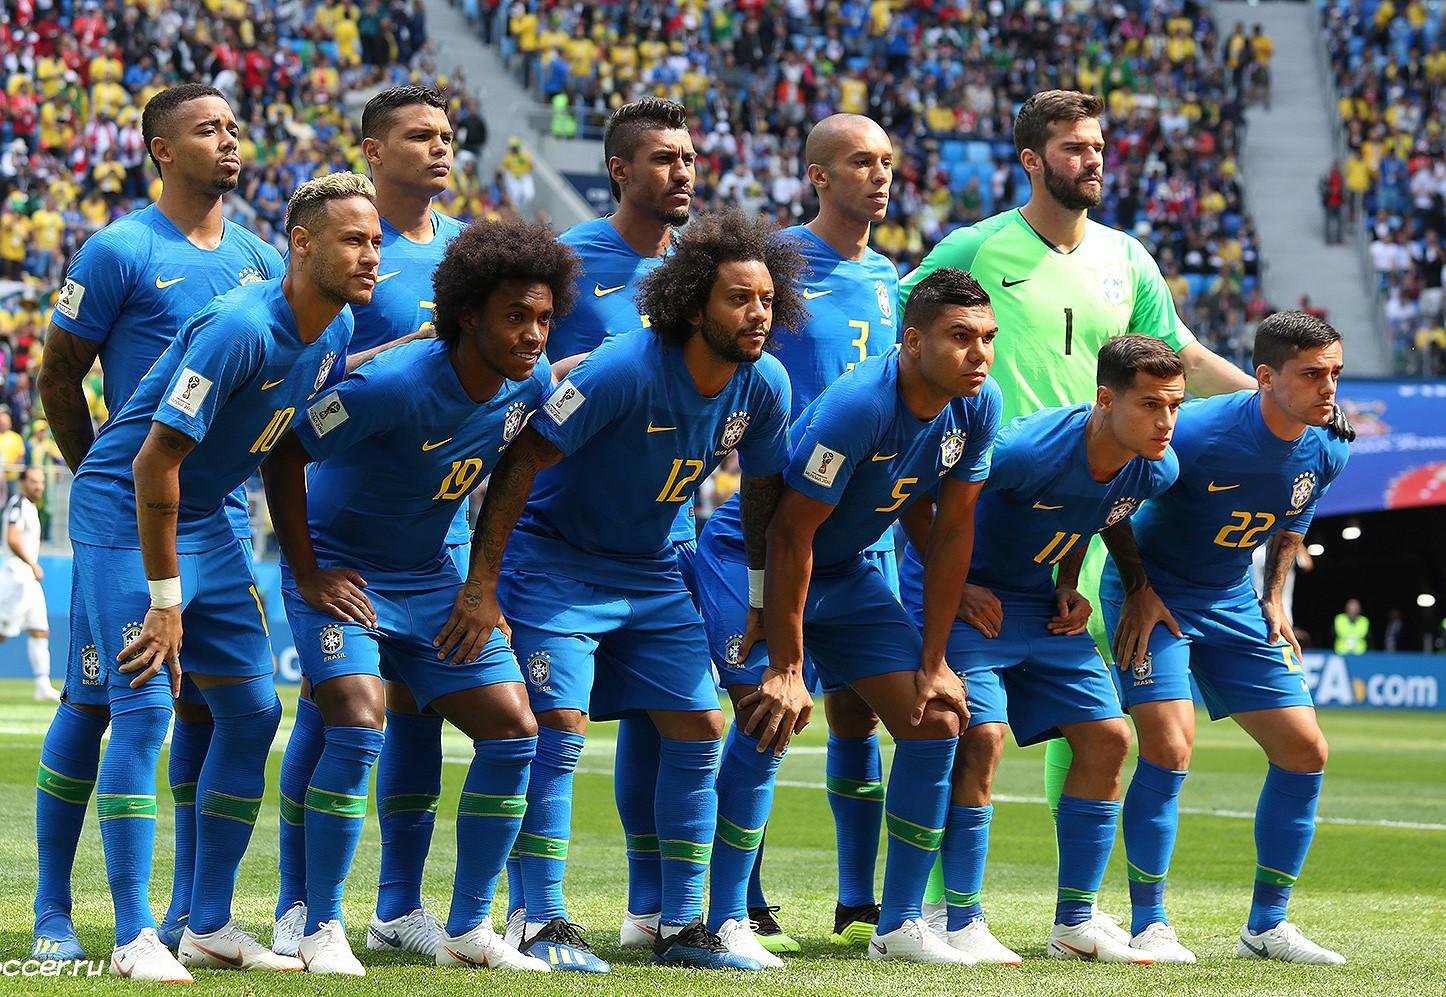 e0027baefdd Brazil at the FIFA World Cup - Wikipedia